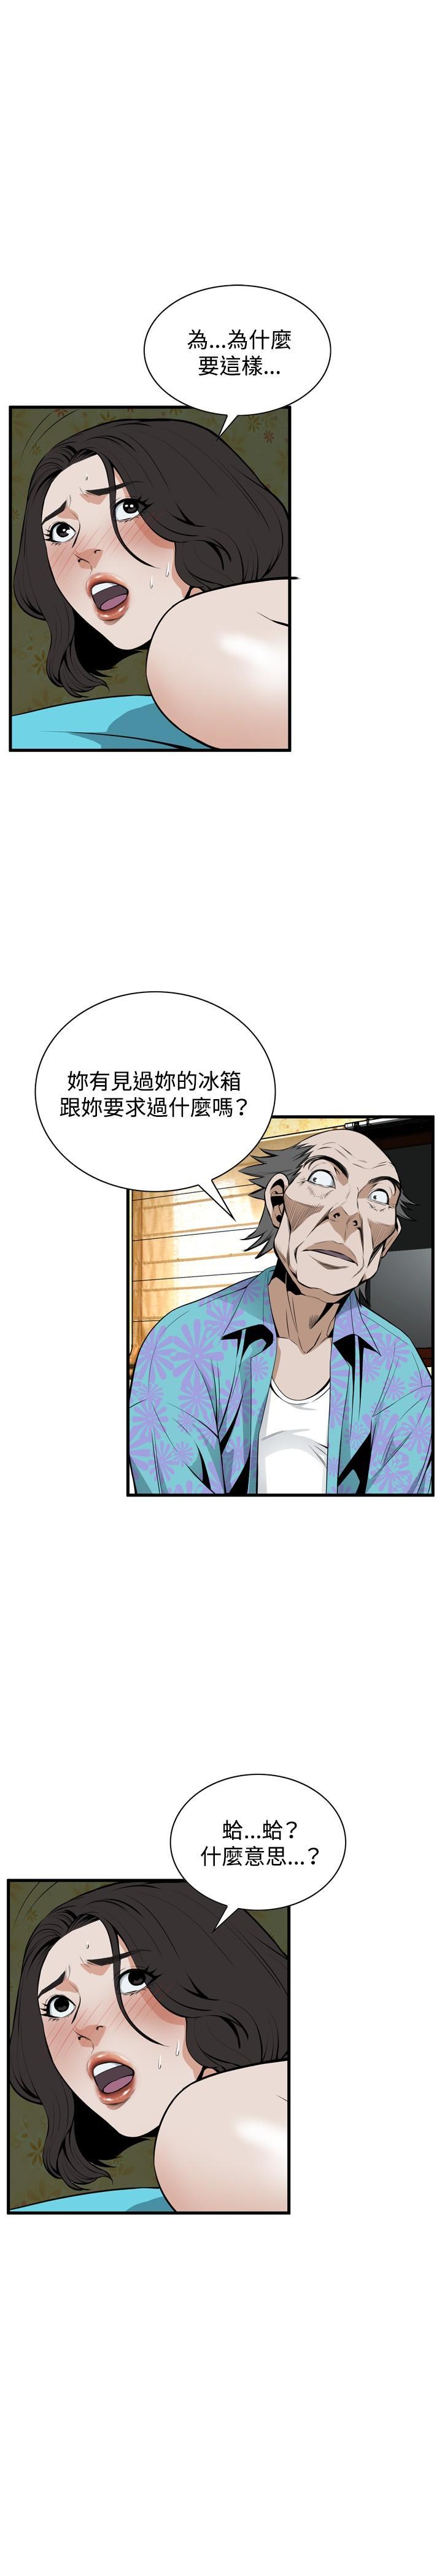 Take a Peek 偷窥 Ch.39~51 [Chinese]中文 131